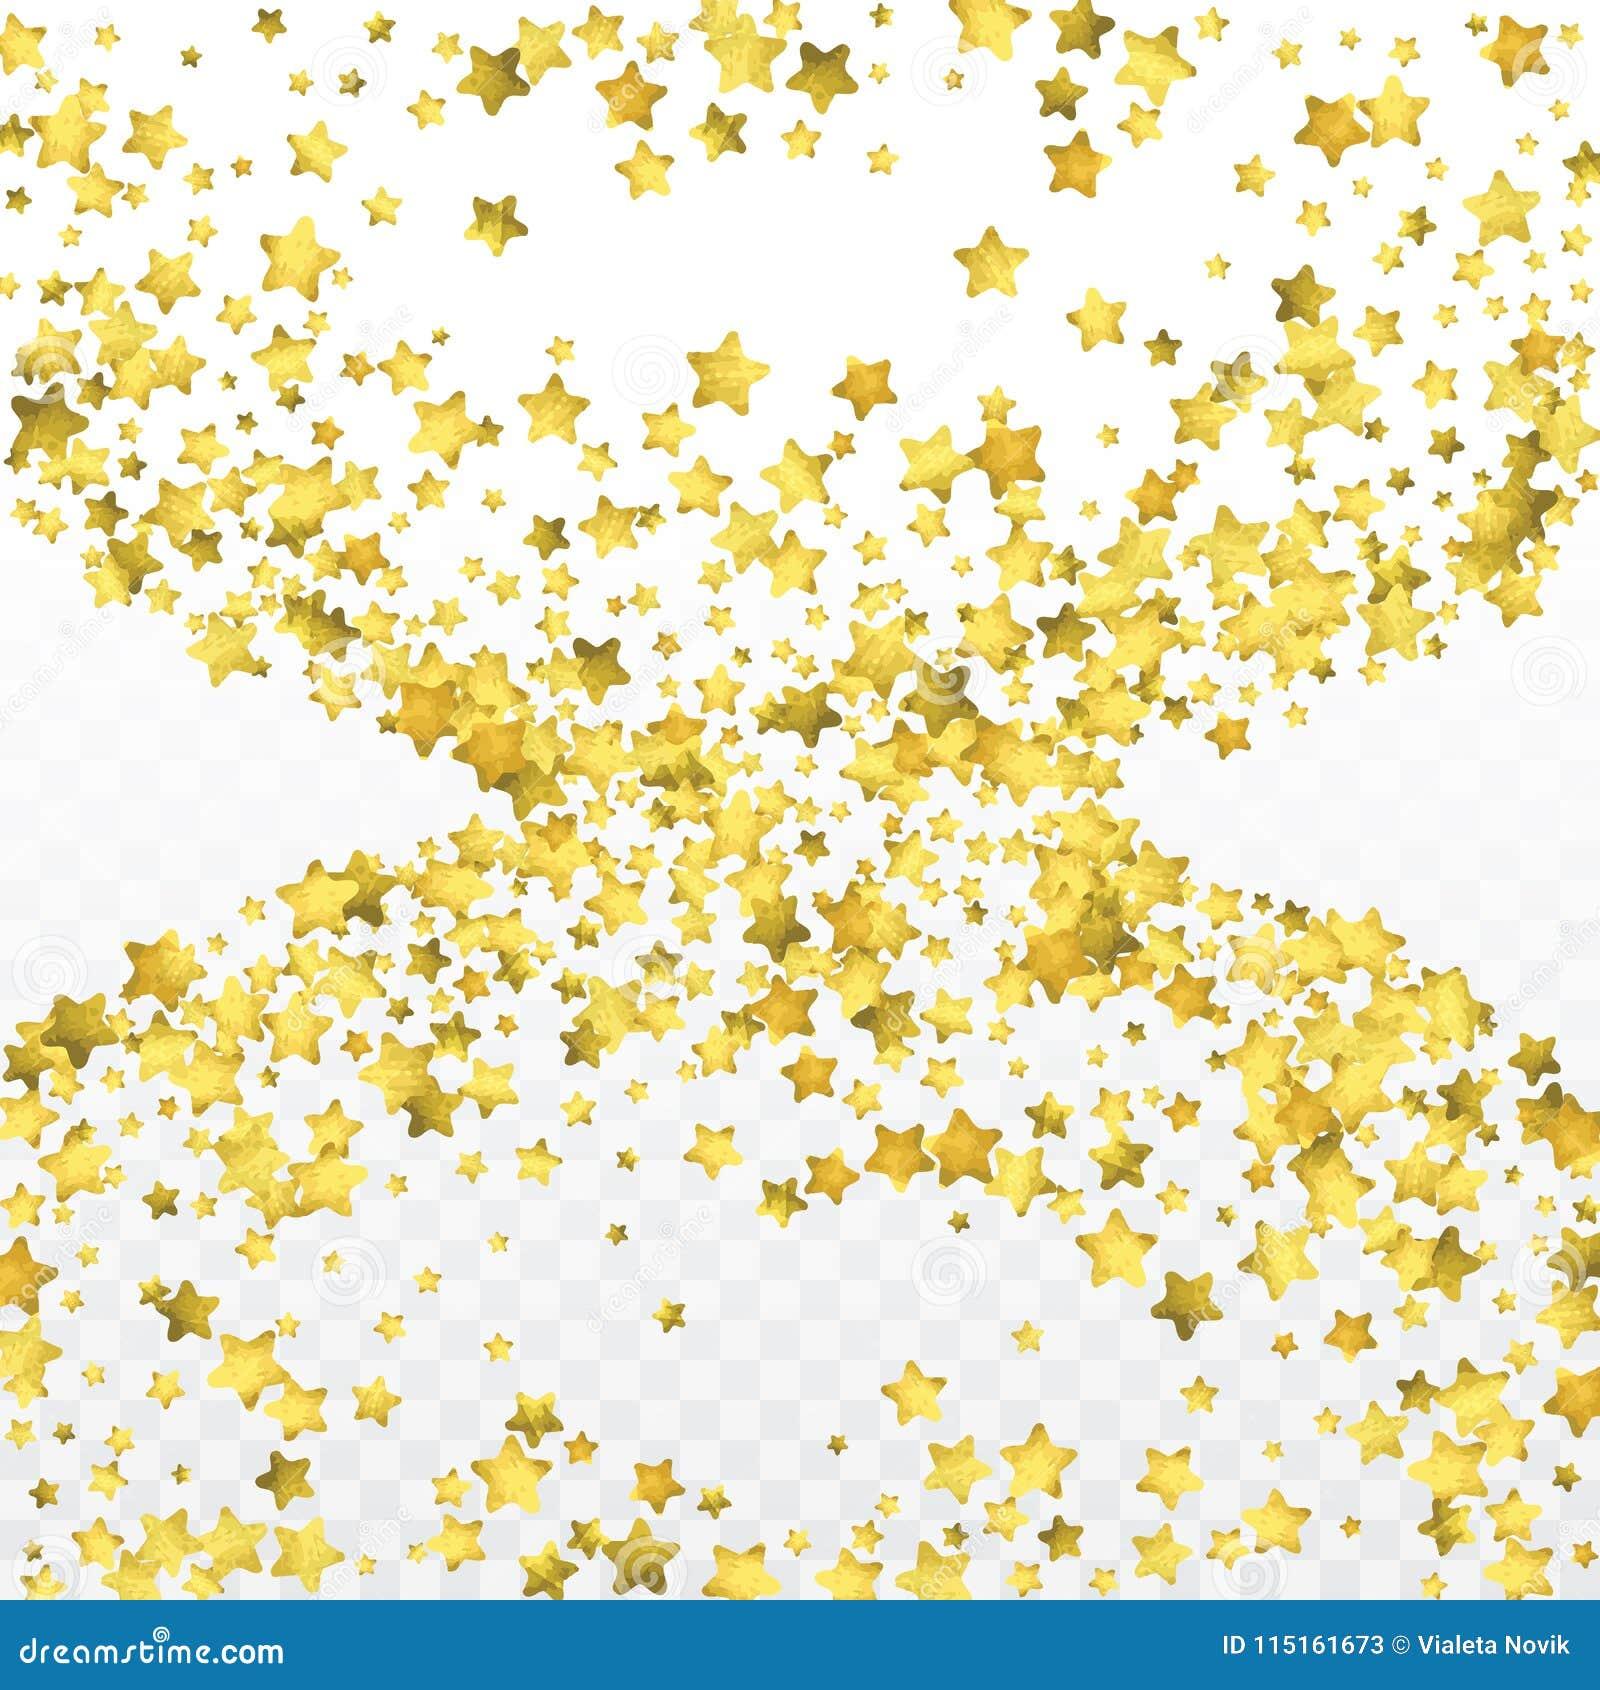 Star gold confetti. Celebrate background. Golden sparkles and dots on black backdrop.